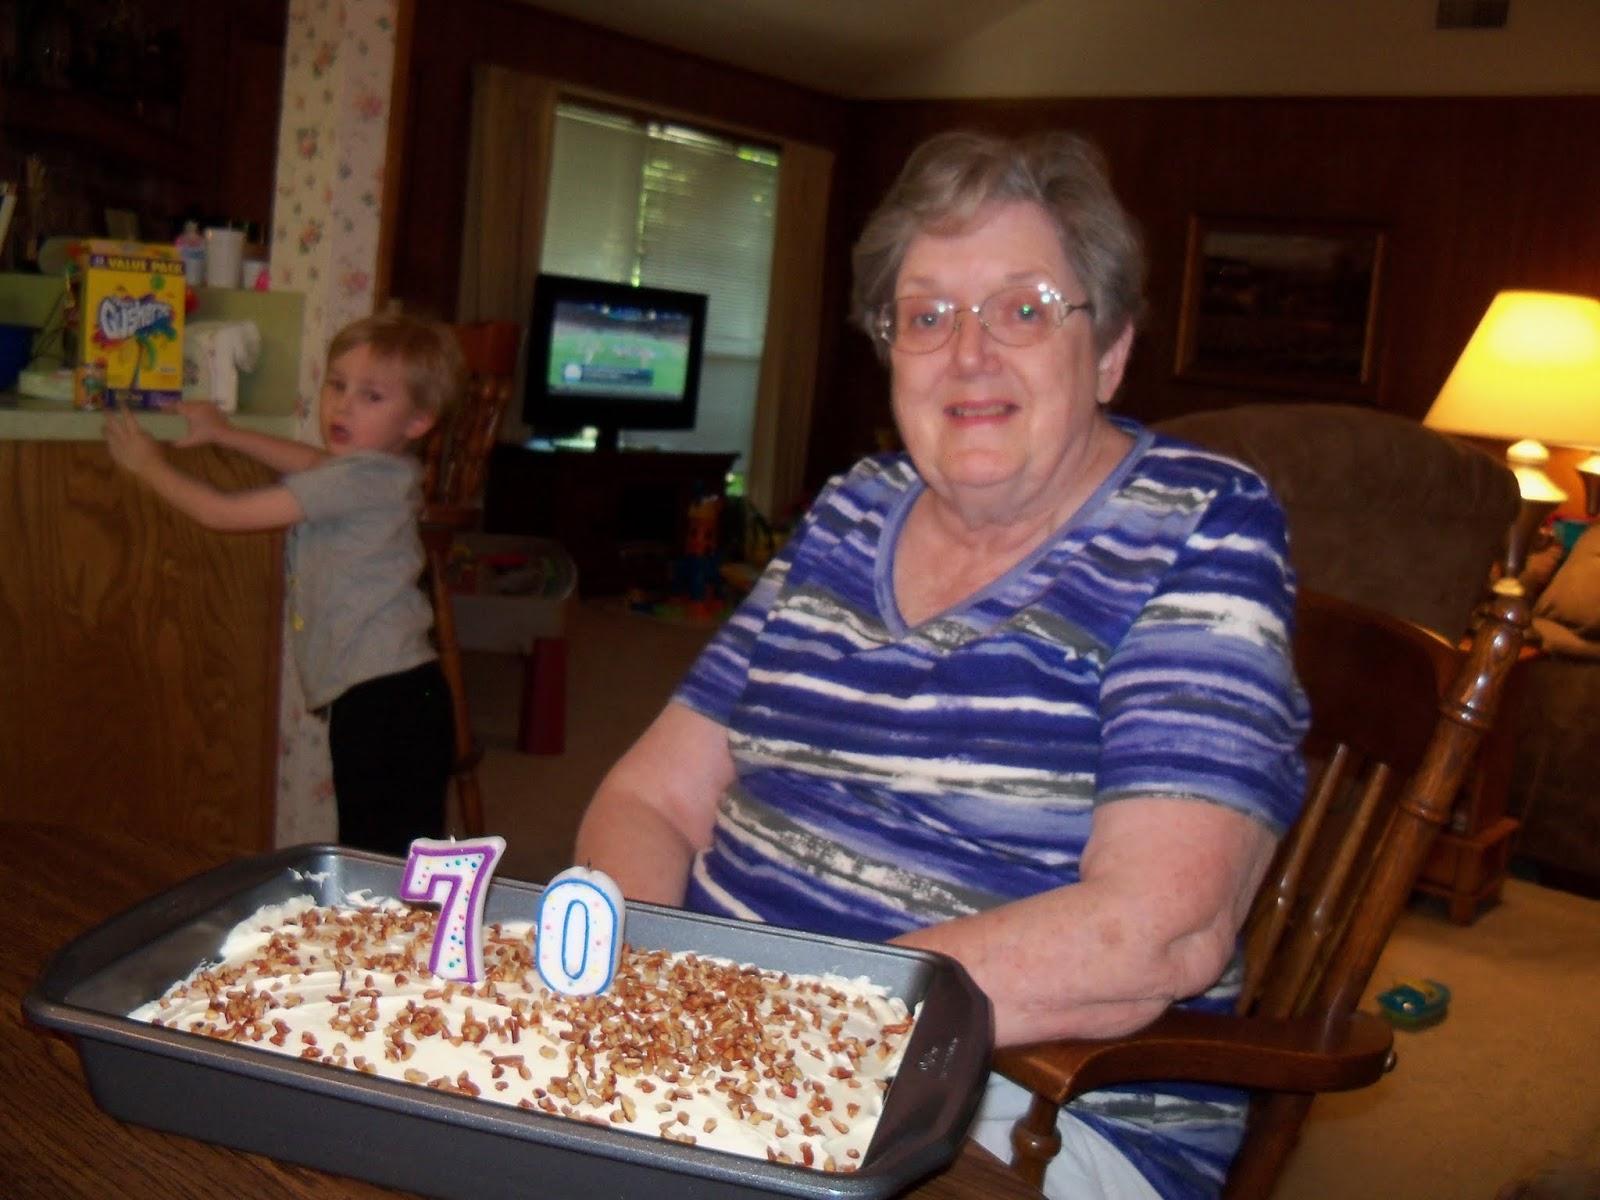 Moms 70th Birthday and Labor Day - 117_0095.JPG